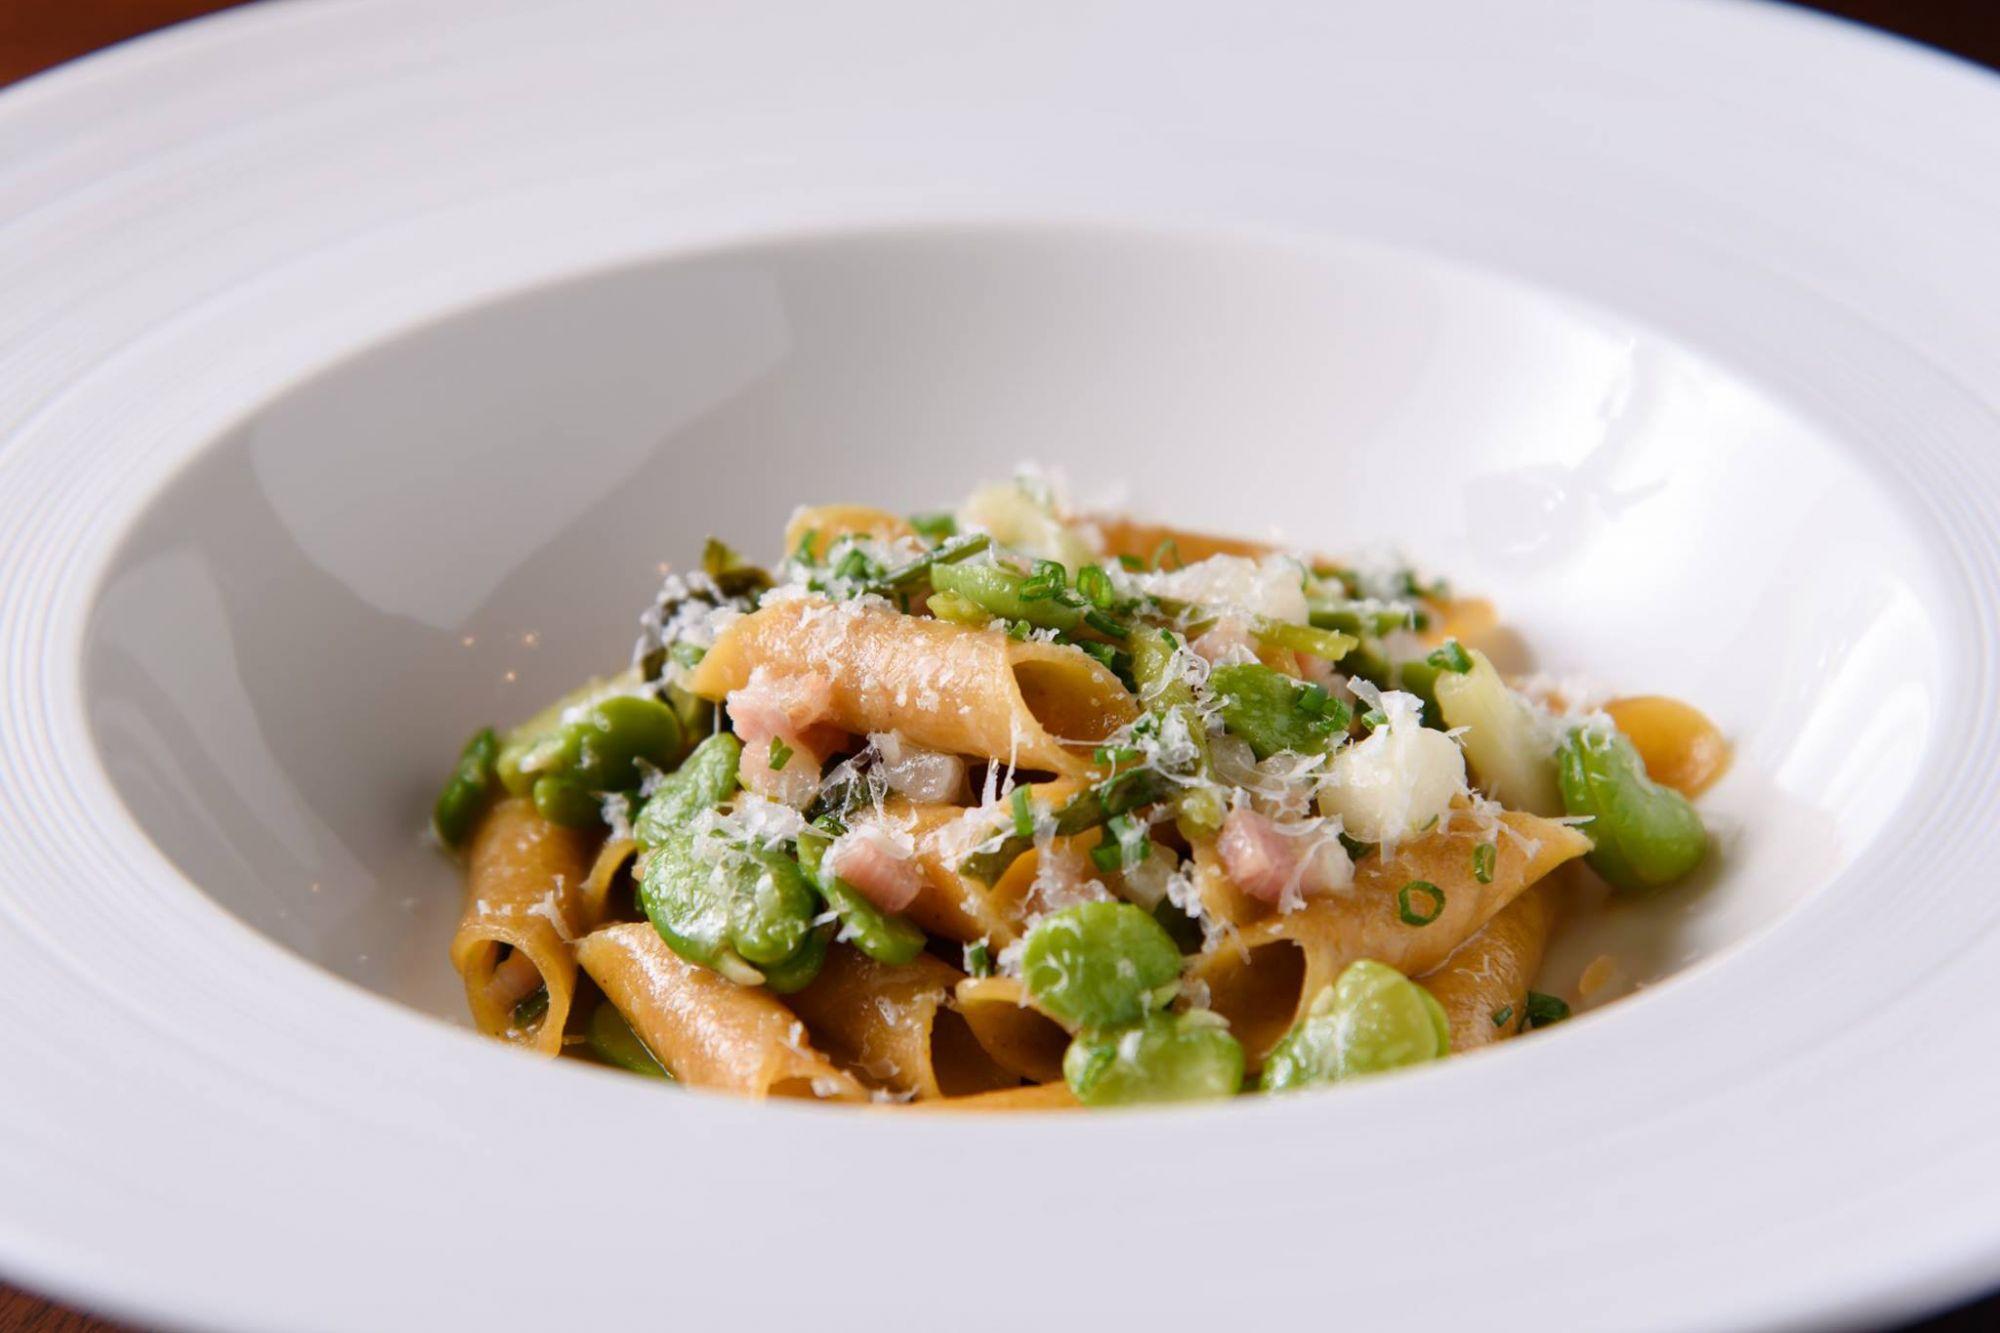 Thailand Tatler's Top Italian Restaurants In Bangkok Of 2019